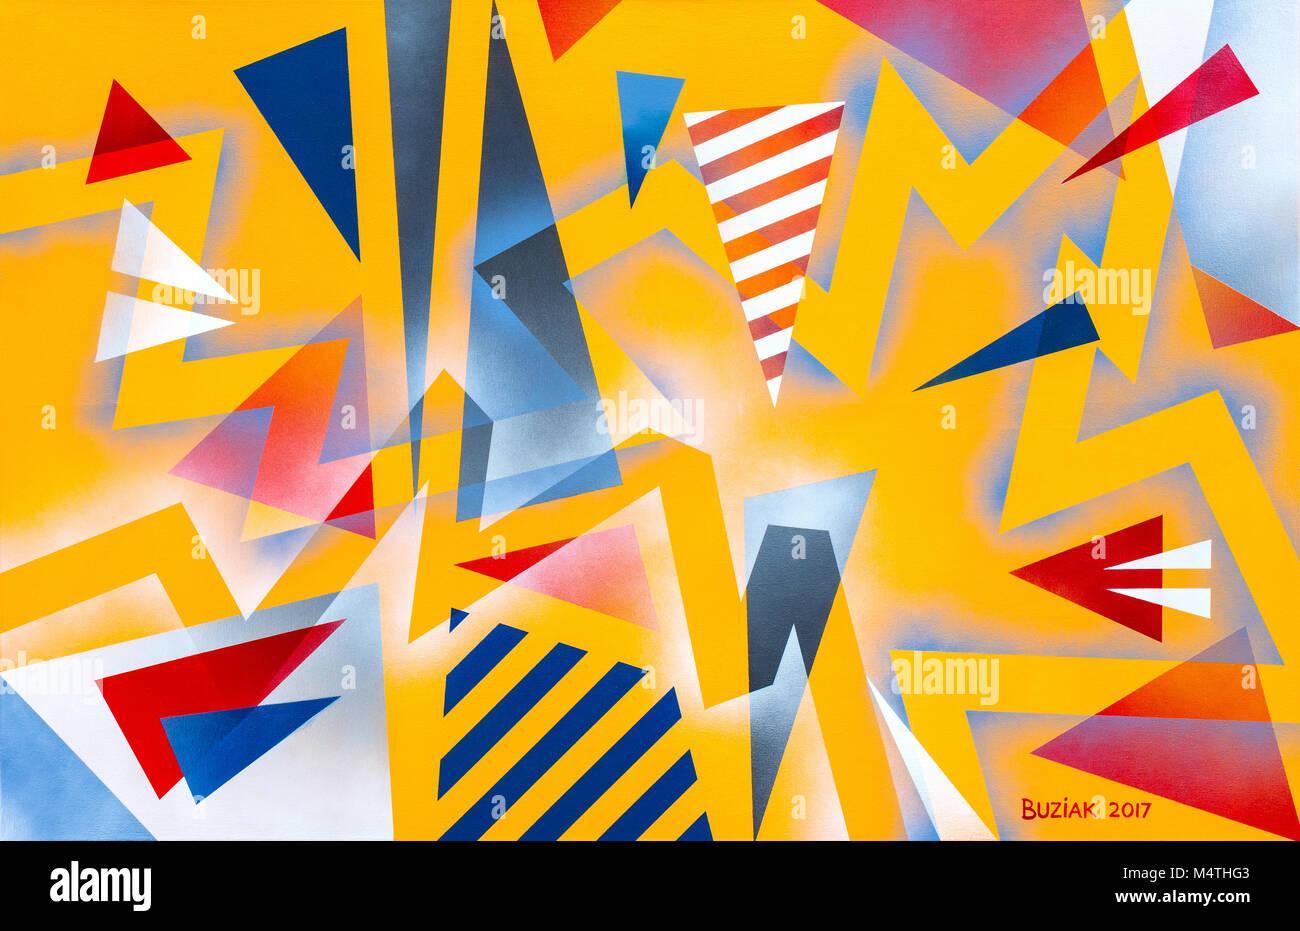 Abstract artwork by Ed Buziak - France. - Stock Image